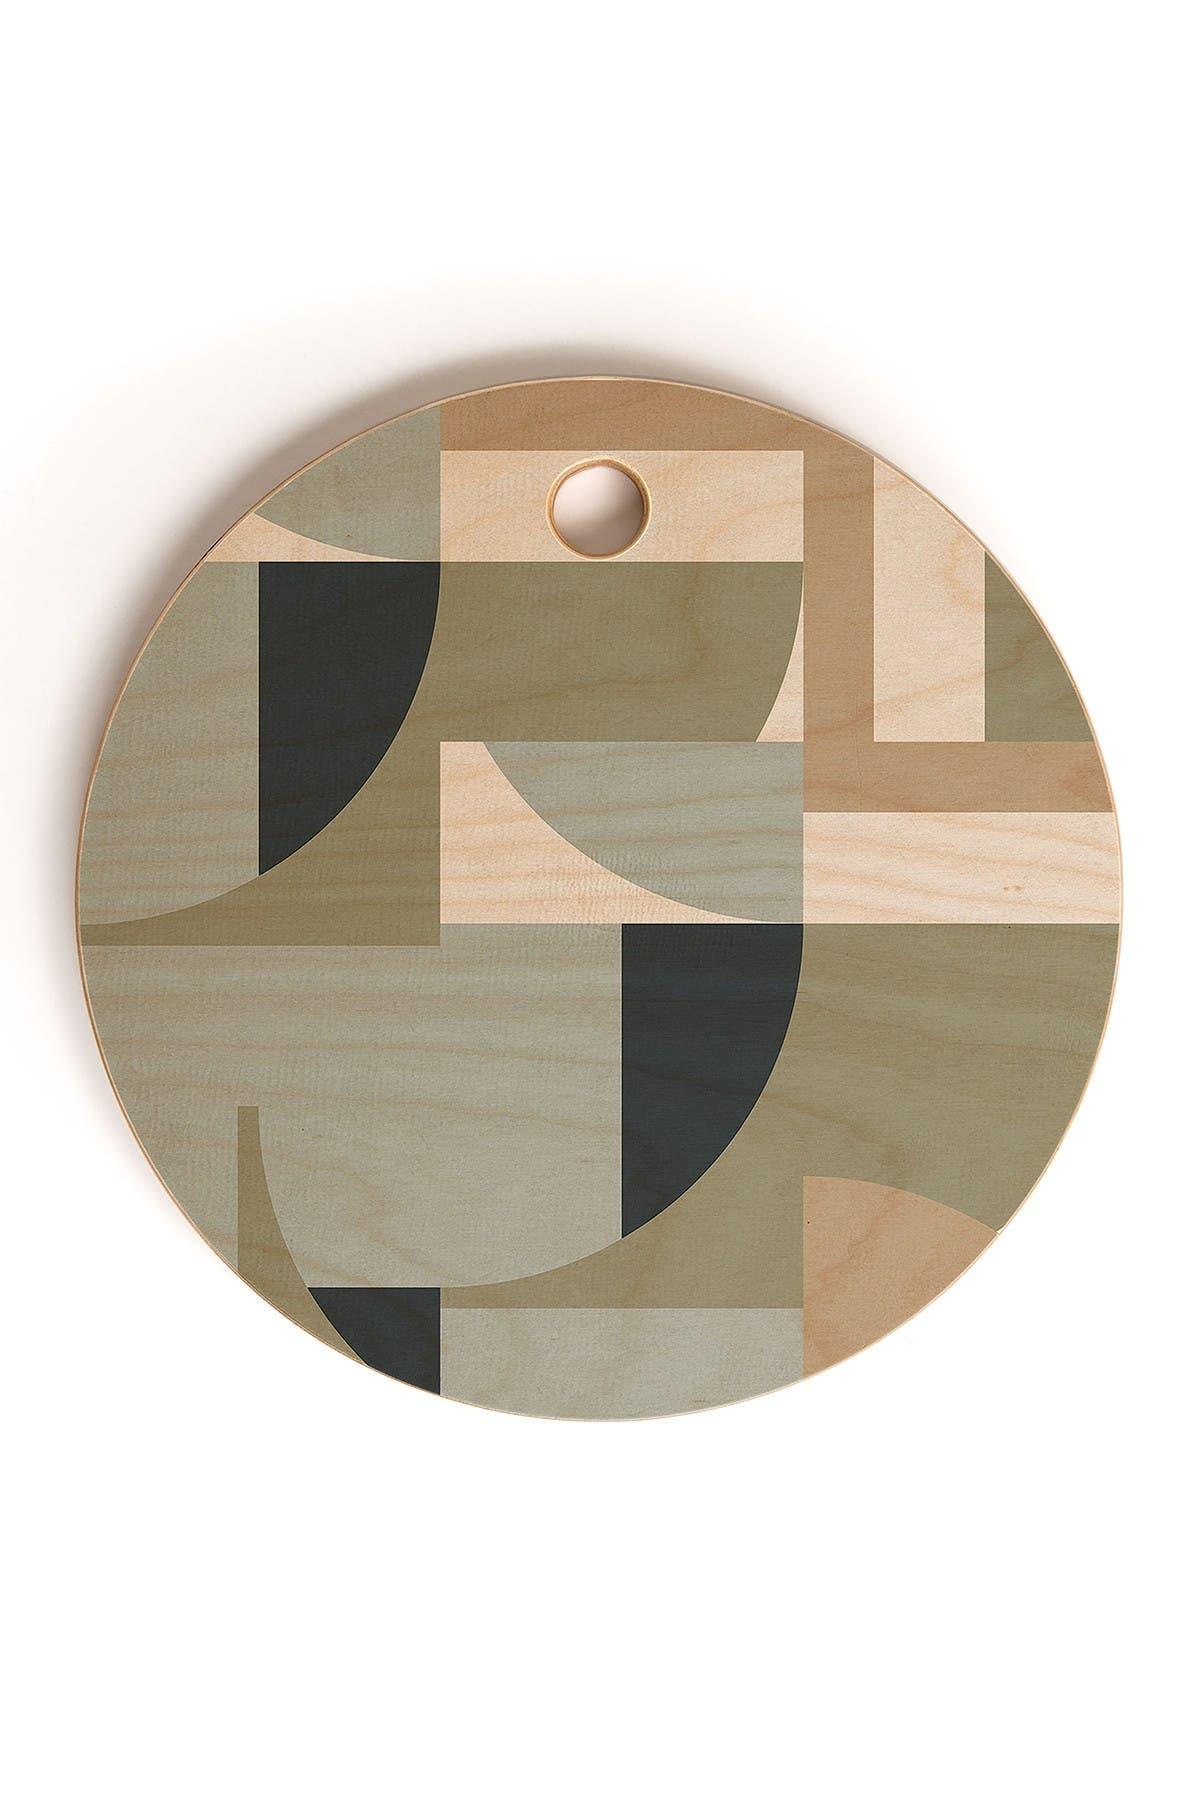 Image of Deny Designs Ninola Design Geometric Surf Sand Round Cutting Board